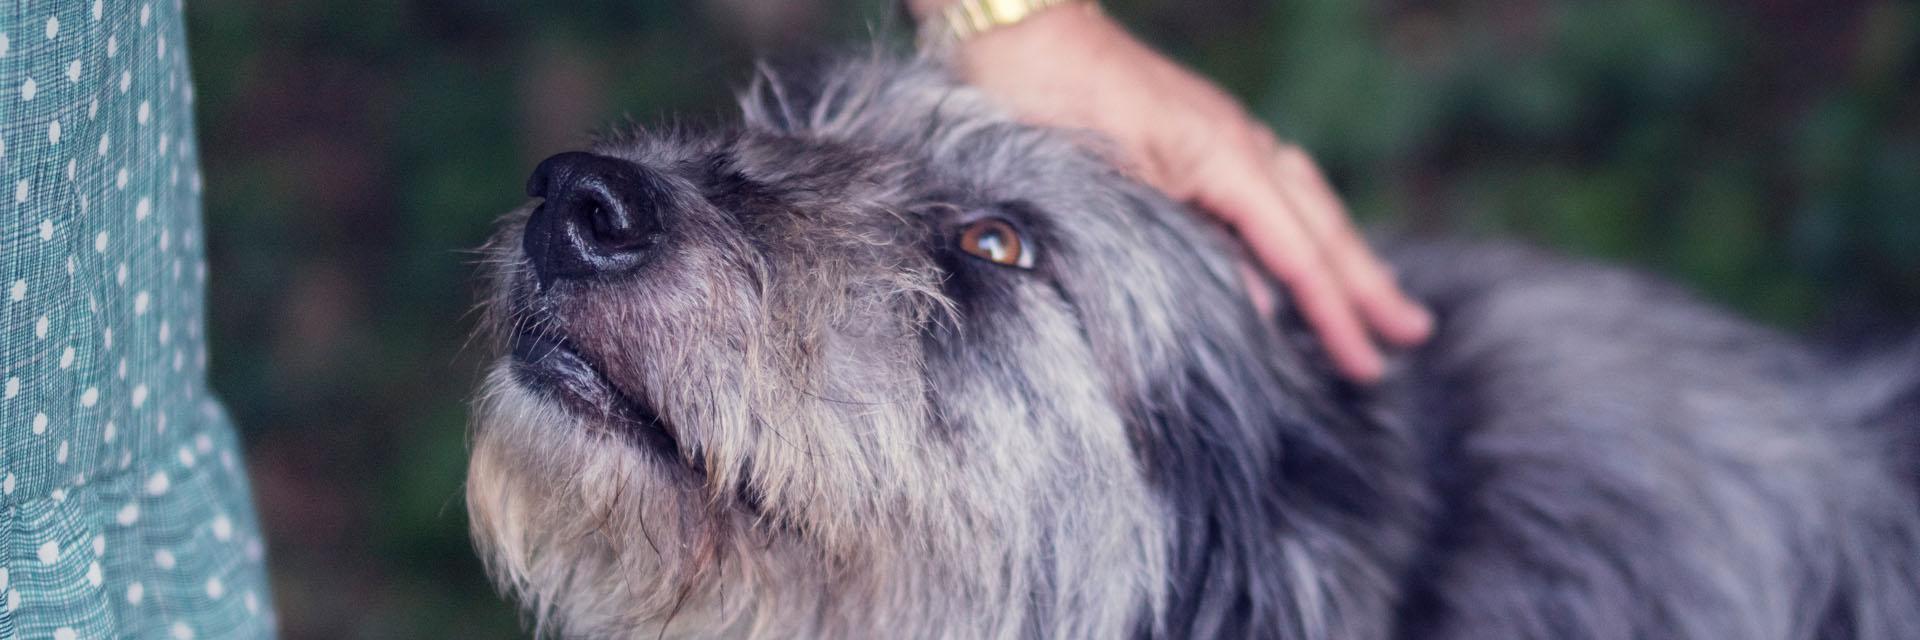 Older Dog with Companion - Faulkville Animal Hospital - Bloomingdale, GA